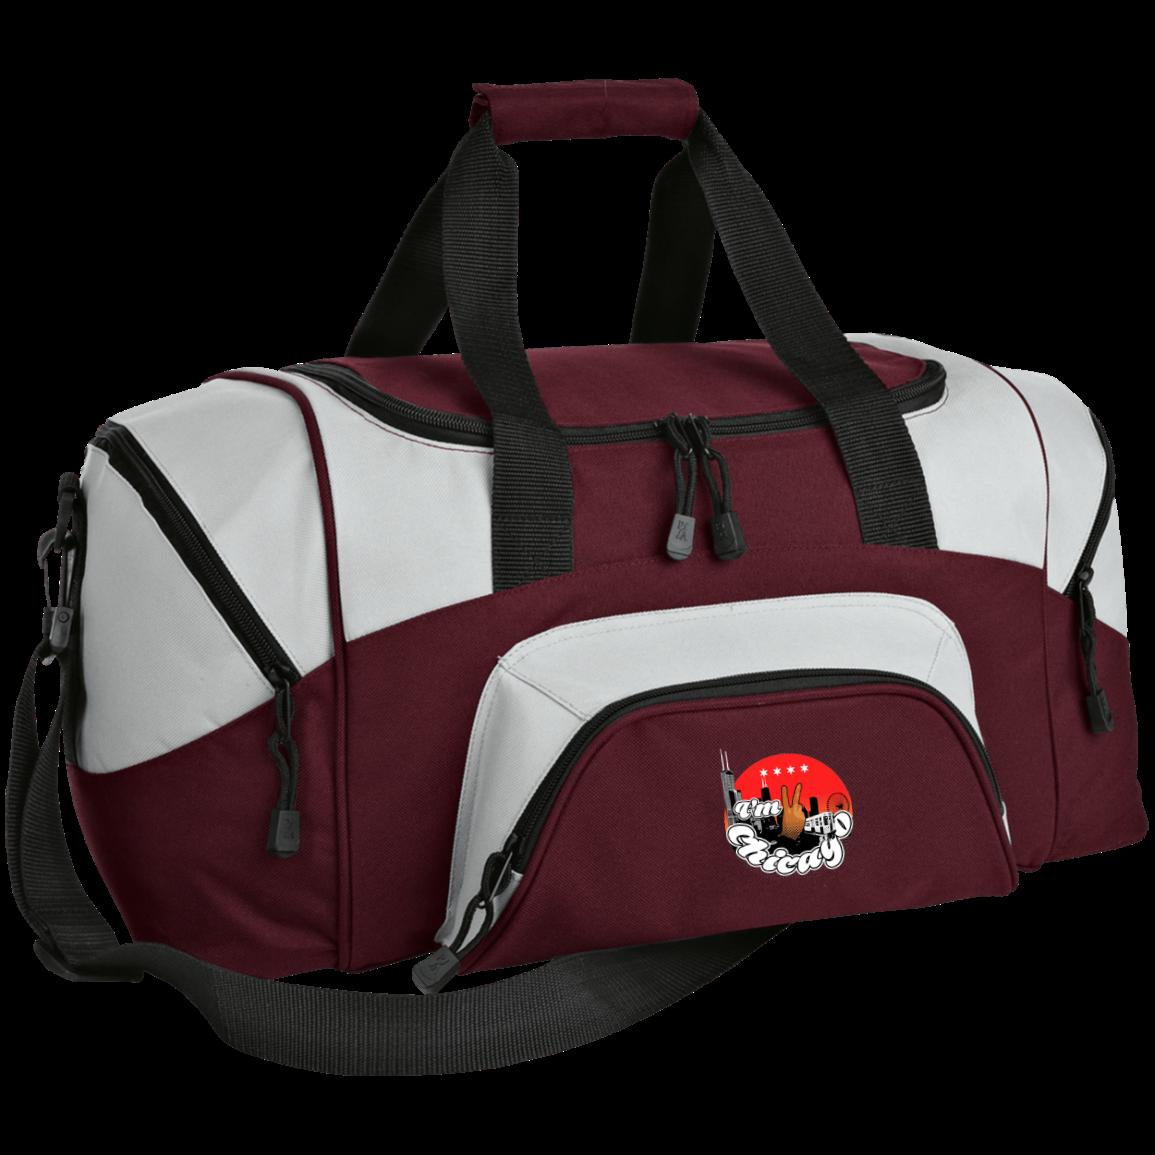 8163a9a795 I m 2 Chicago Port   Co. Small Colorblock Sport Duffel Bag ...